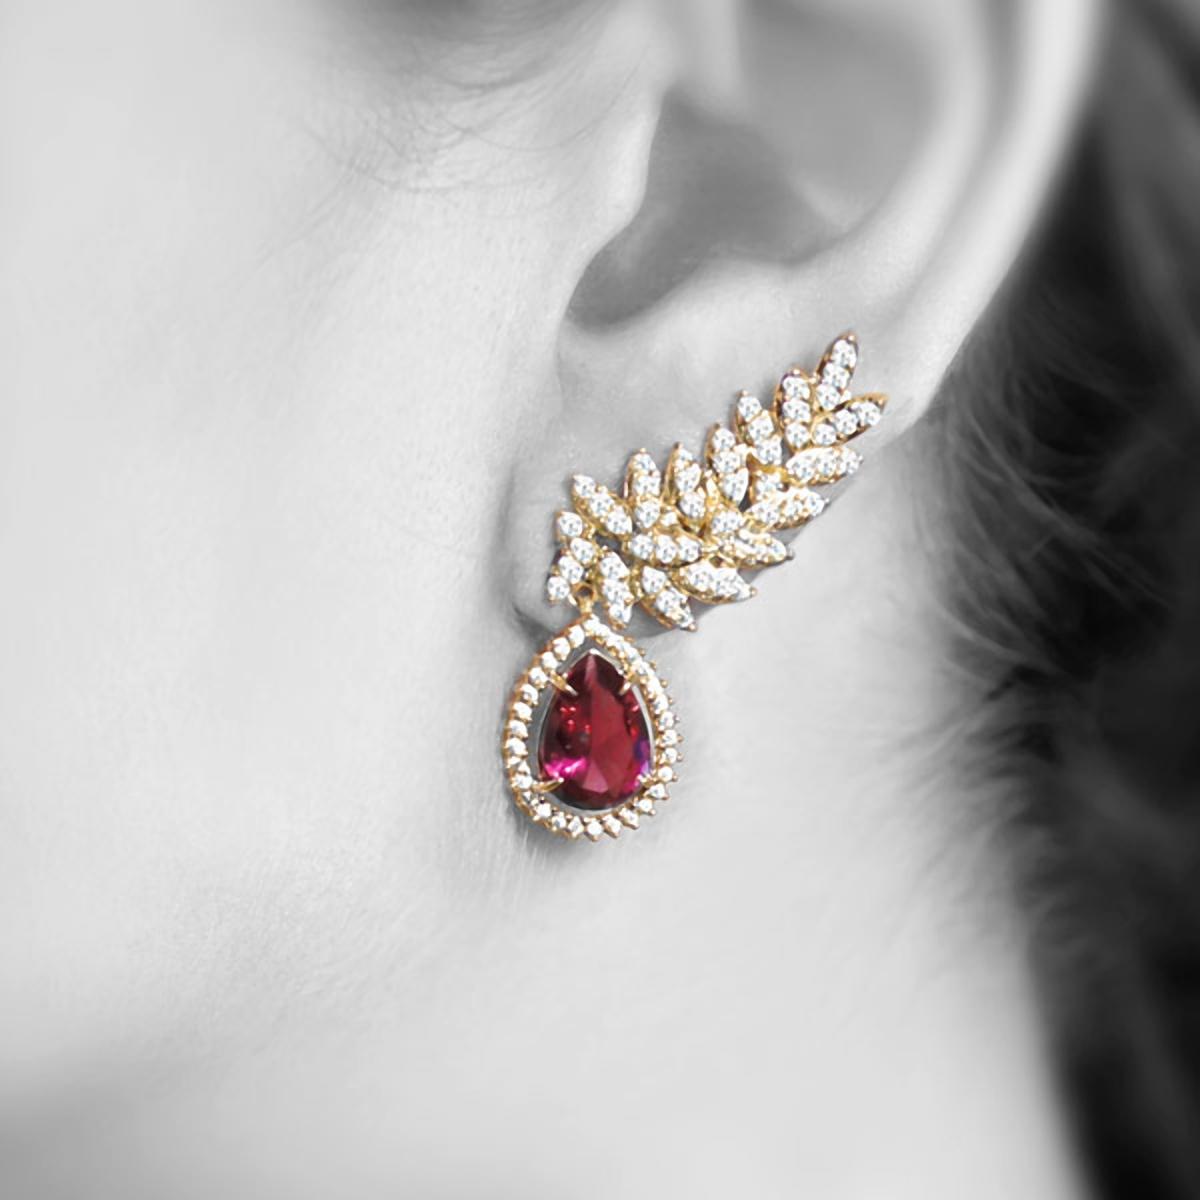 338ee46c75a21 ... Brinco Ear Cuff Semijoia em Ouro 18K com Zircônia Cristal e Cristal Rubi  Gota - SOLOYOU